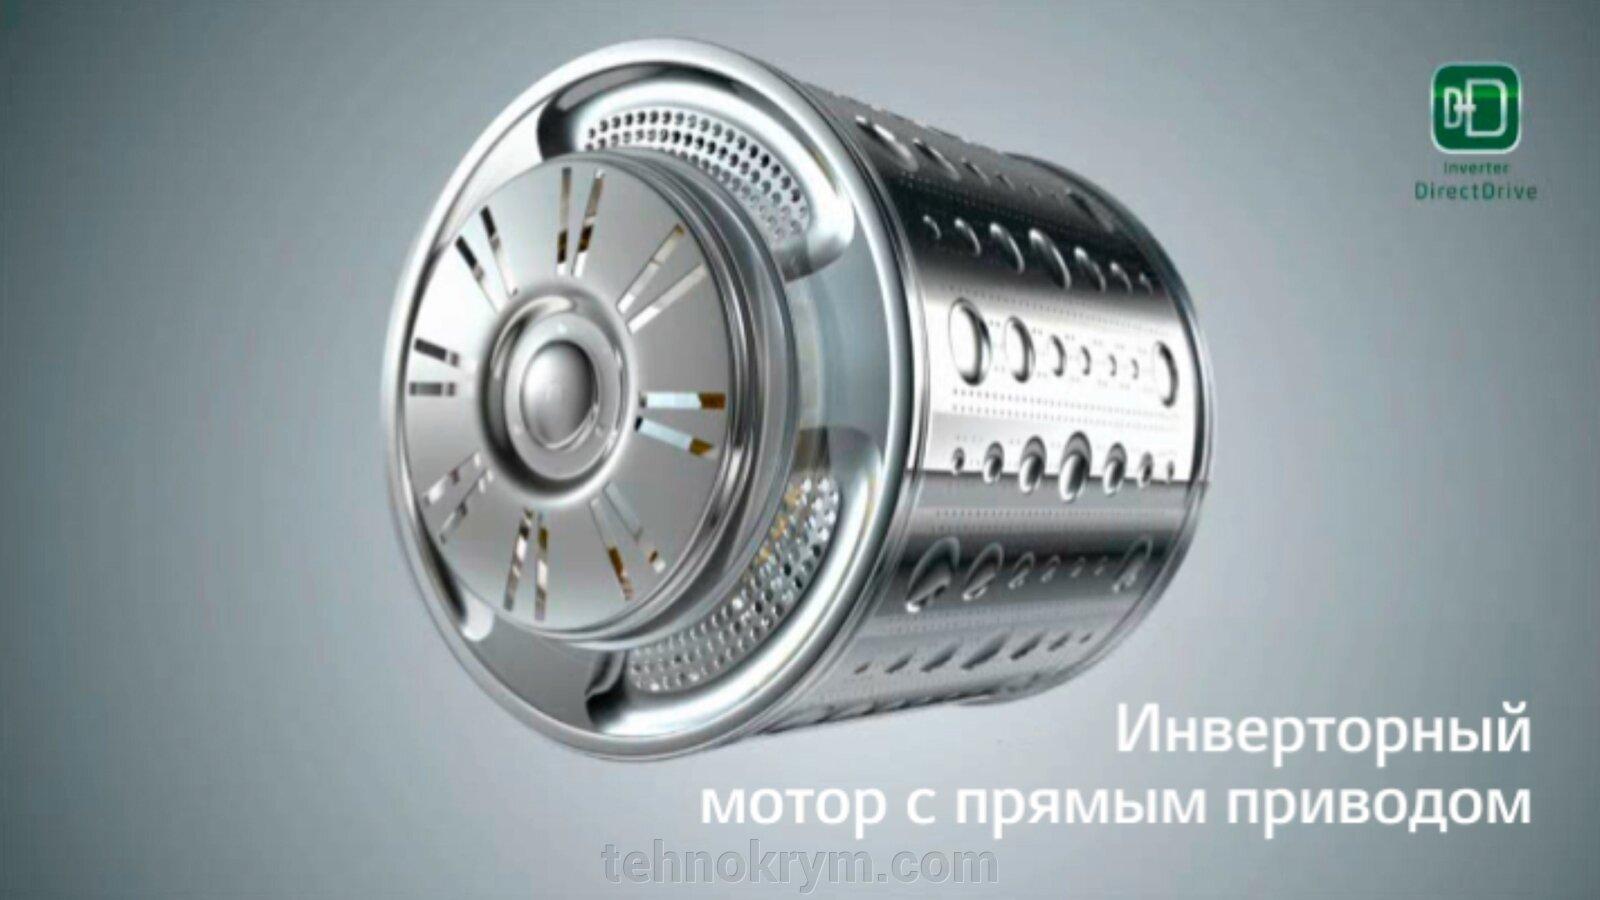 pic_a45ddf11feea33e9066e8ee4c041ec5c_1920x9000_1.jpg